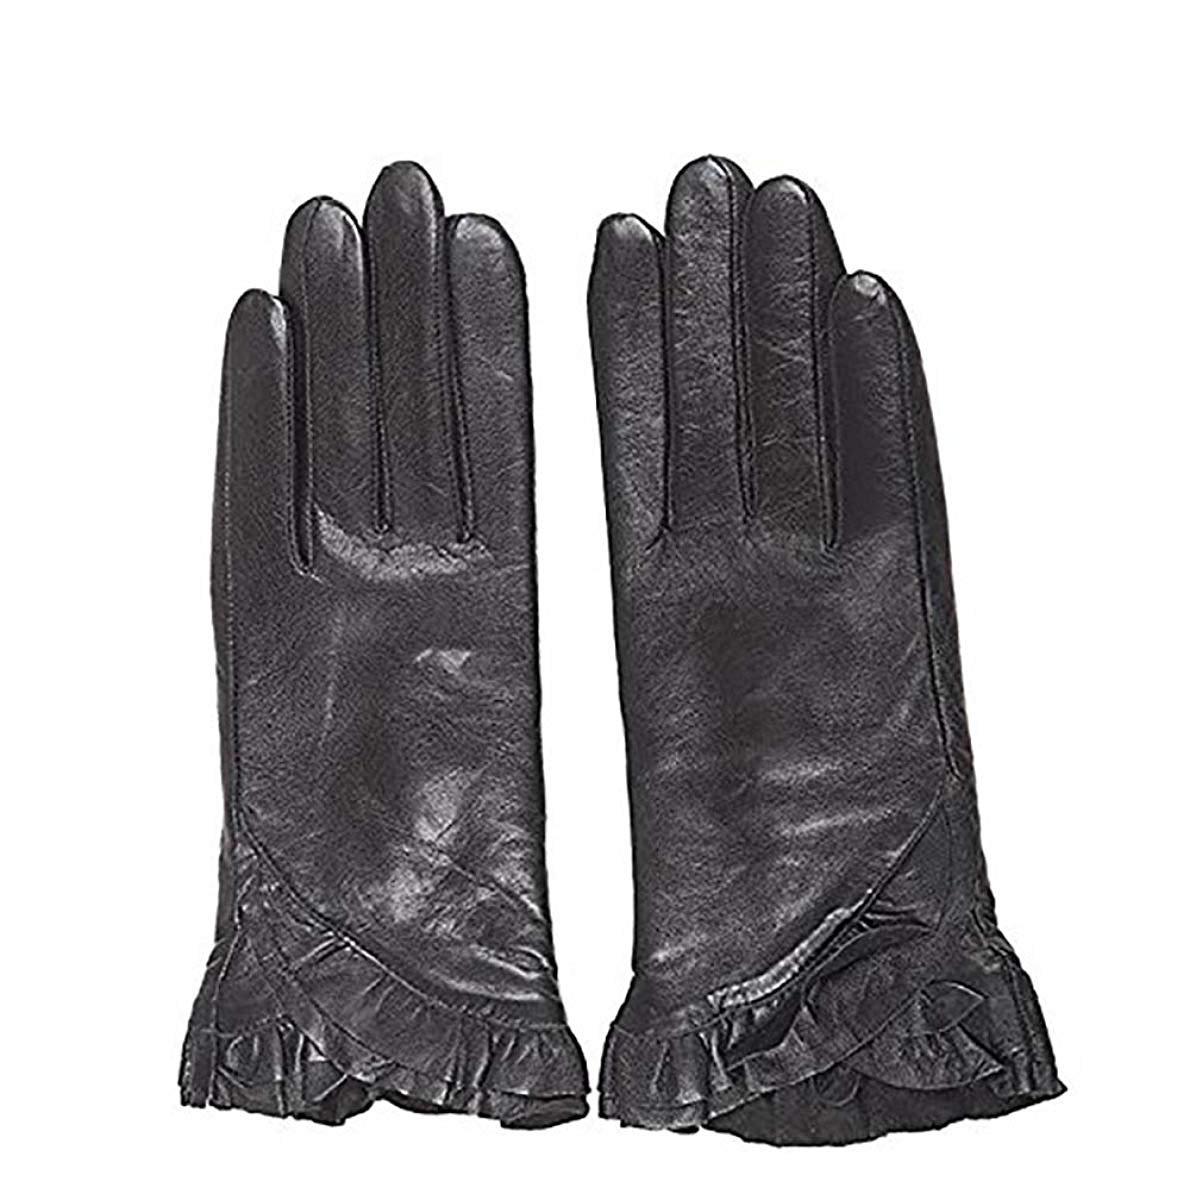 CWJ Women's Real Leather Gloves Short Fashion Thin Classic Touchscreen Texting Black,Black,Medium